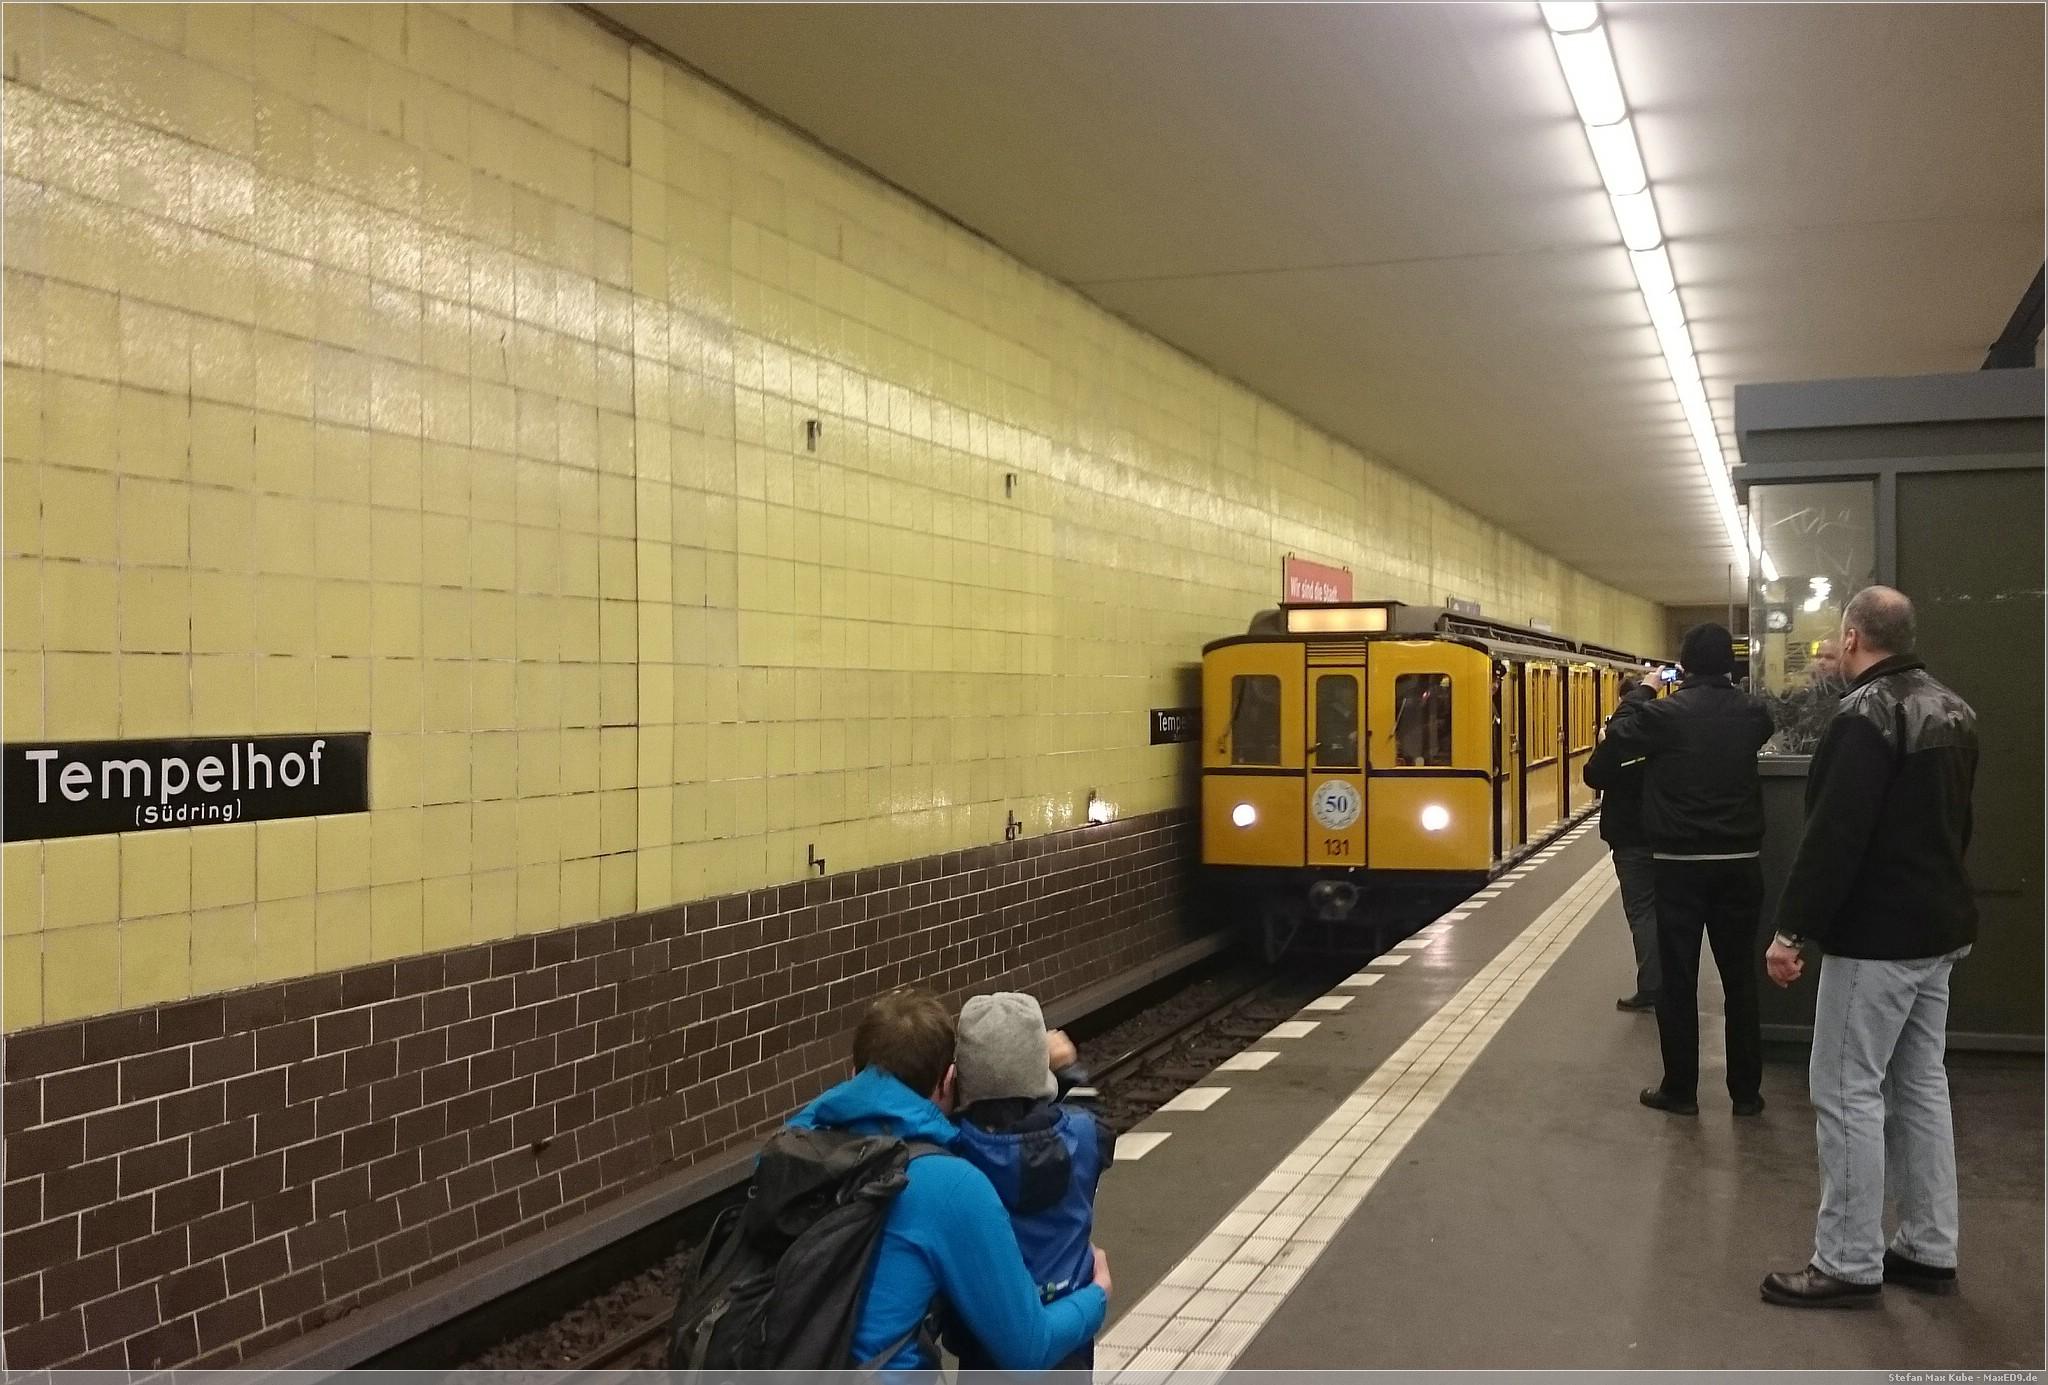 Zug fährt ein am Bahnhof Tempelhof